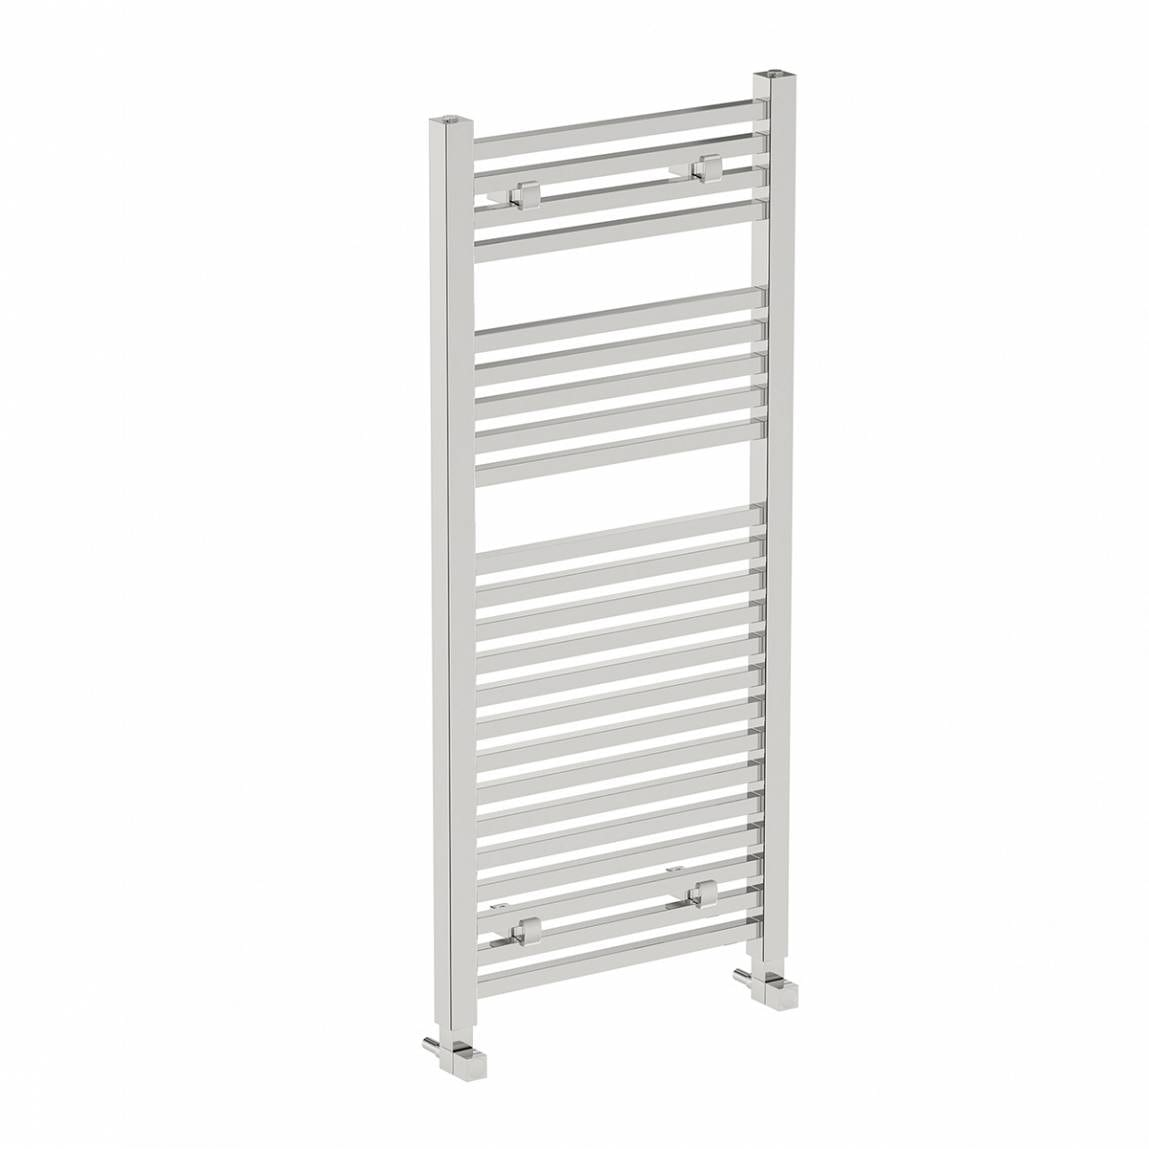 Wye Heated Towel Rail 1200 x 490